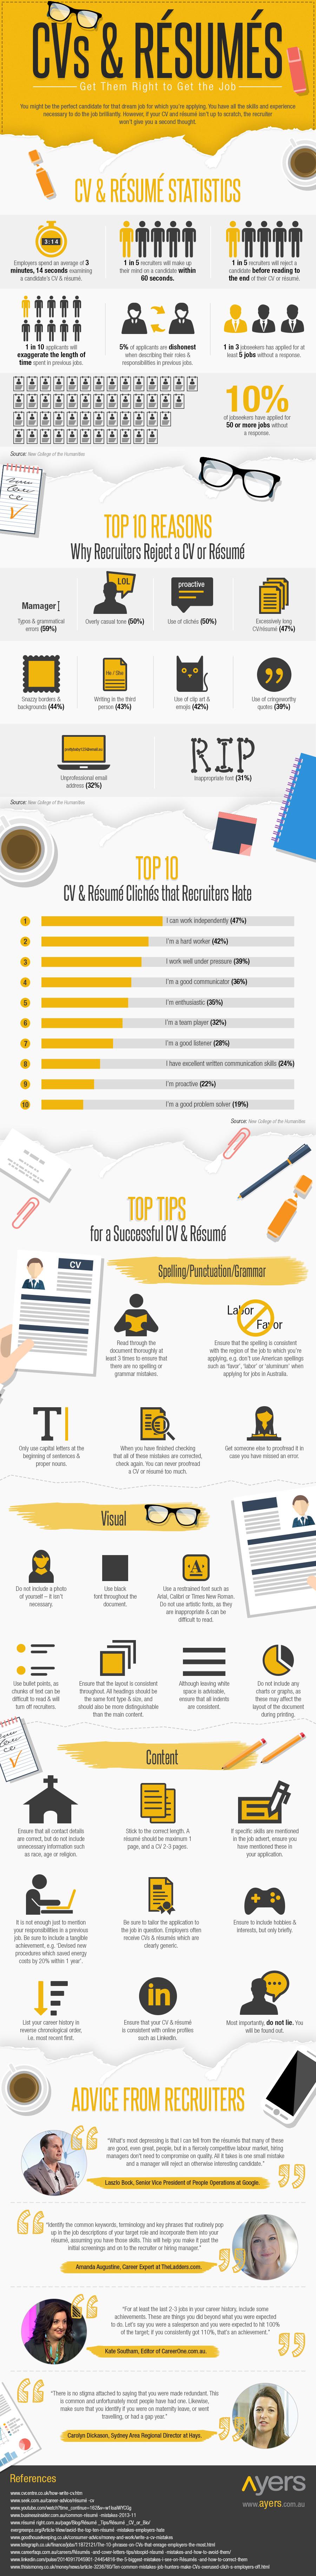 CVs-Resumes-Get-Them-Right-to-Get-the-Job.jpg